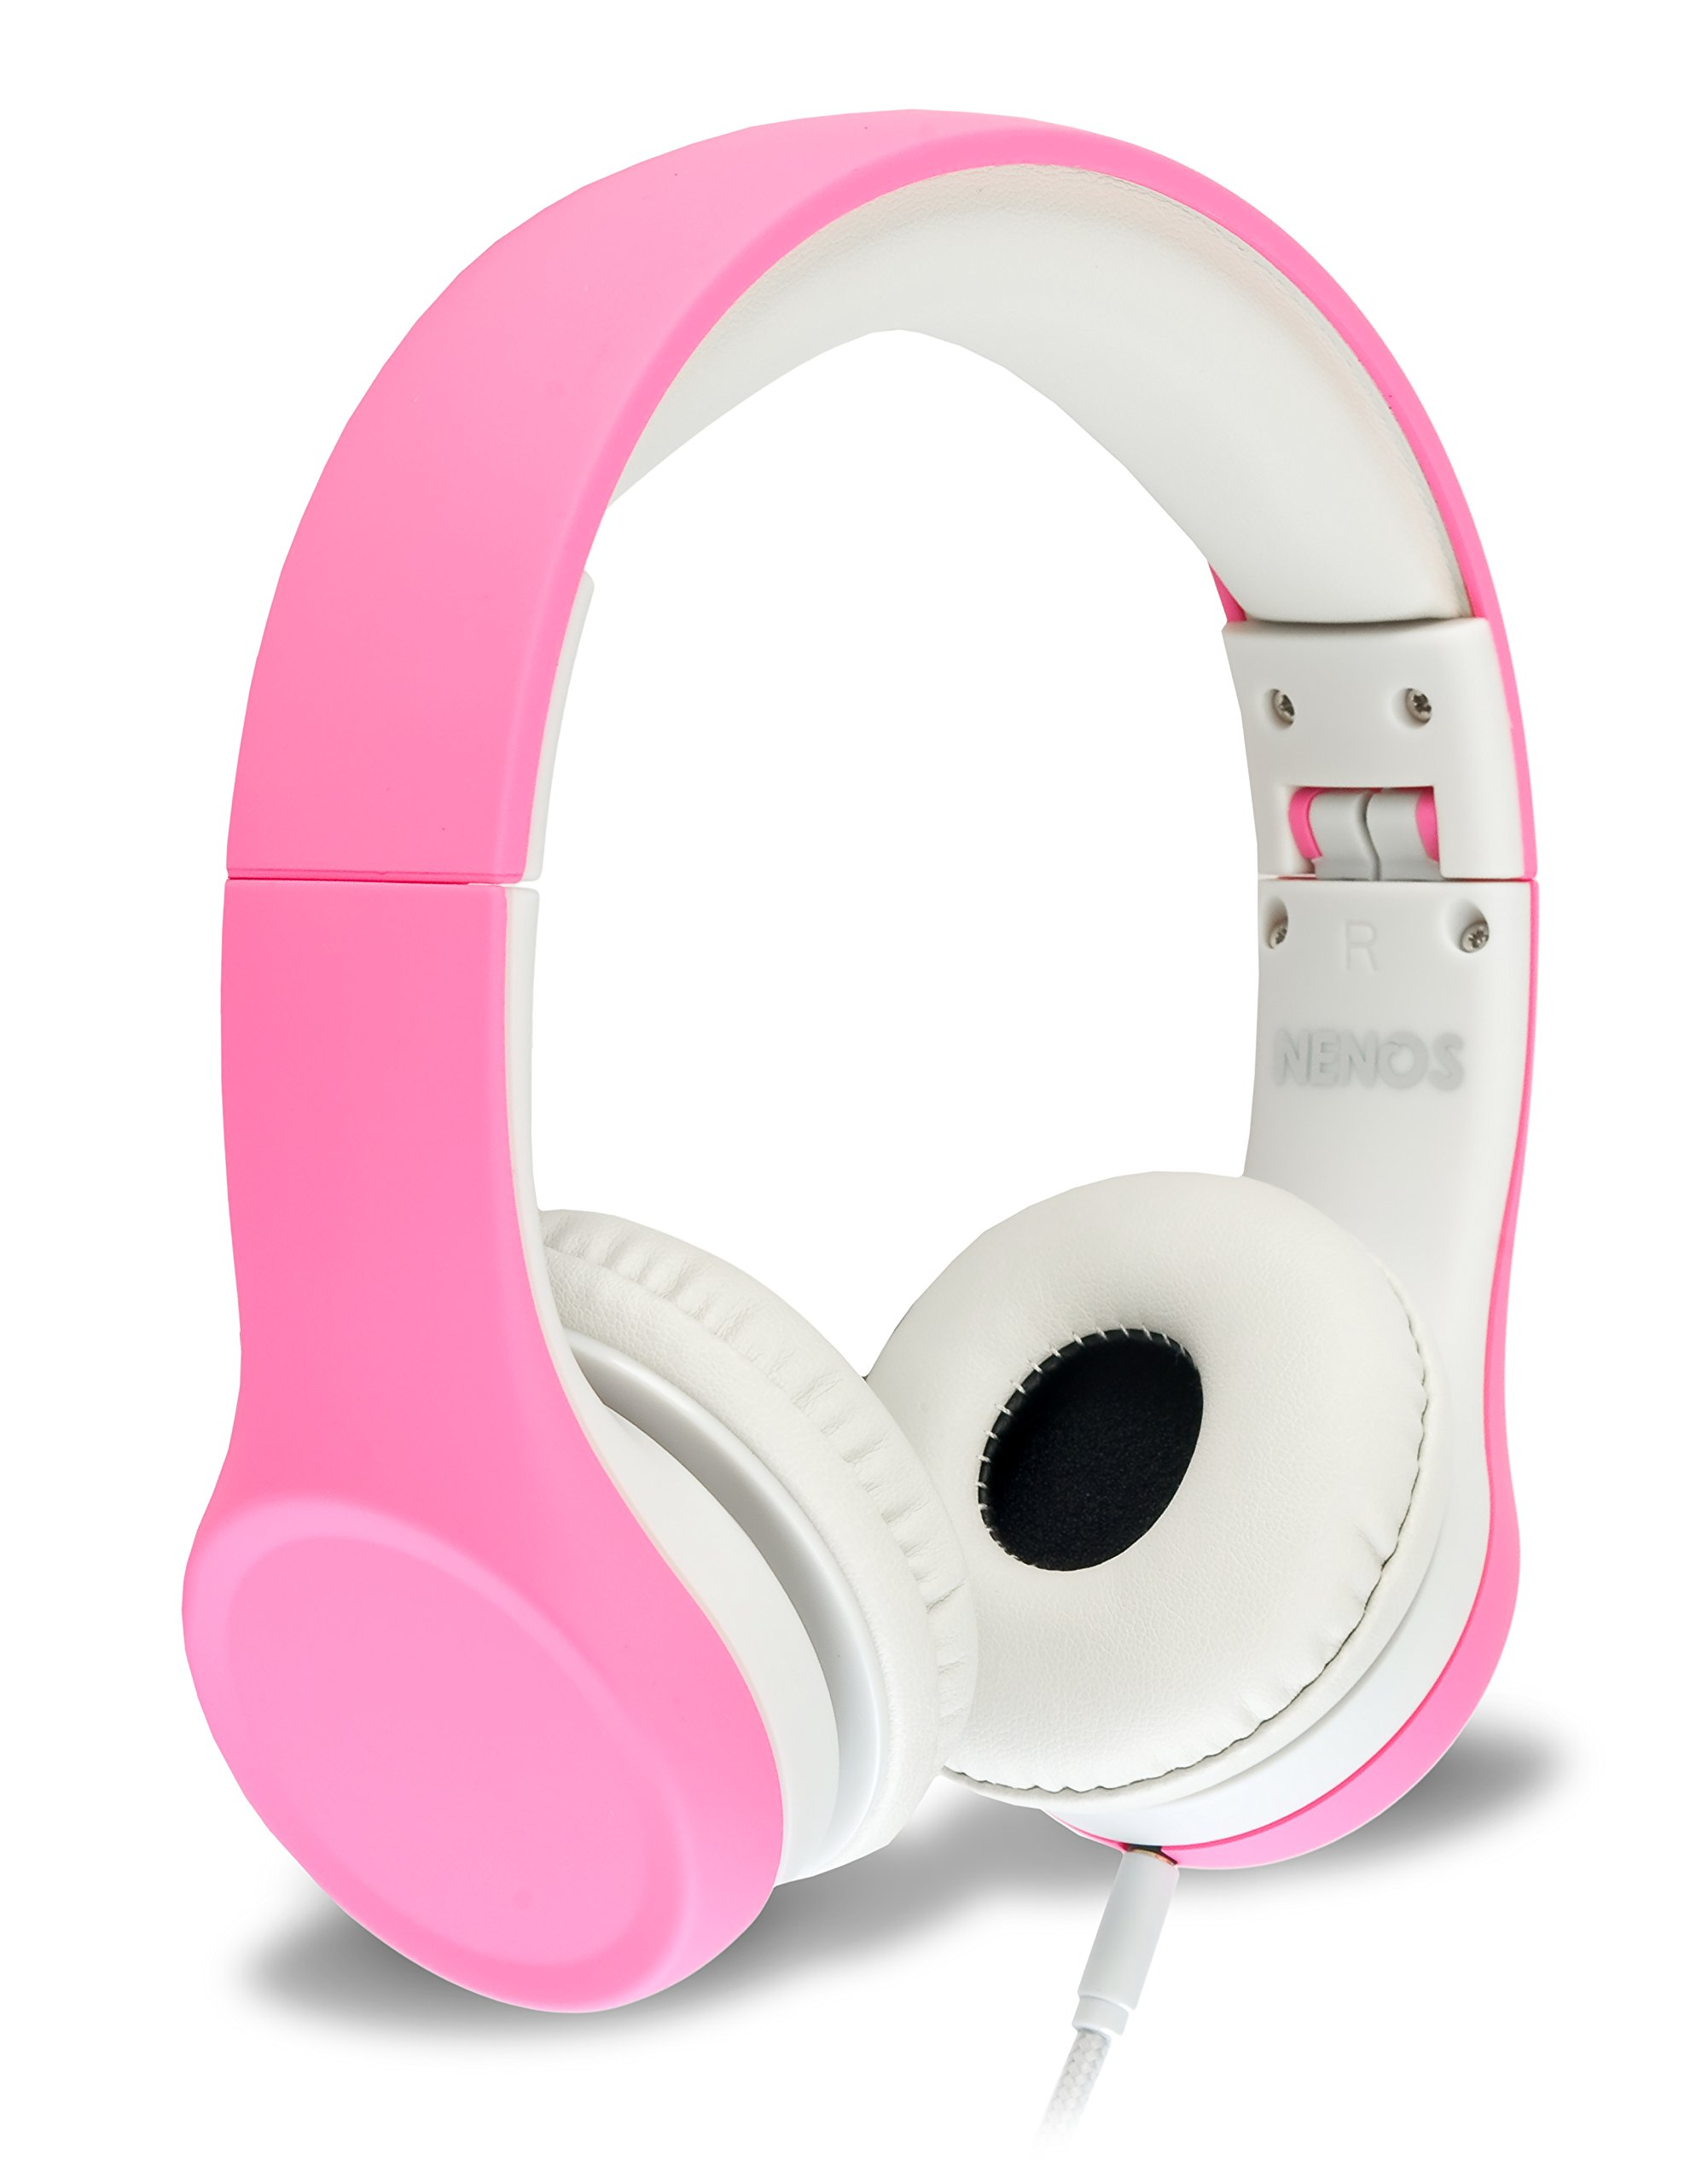 Nenos Children Headphones Kids Headphones Children's Headphones Volume Limited Headphones for Kids Foldable (Pink)